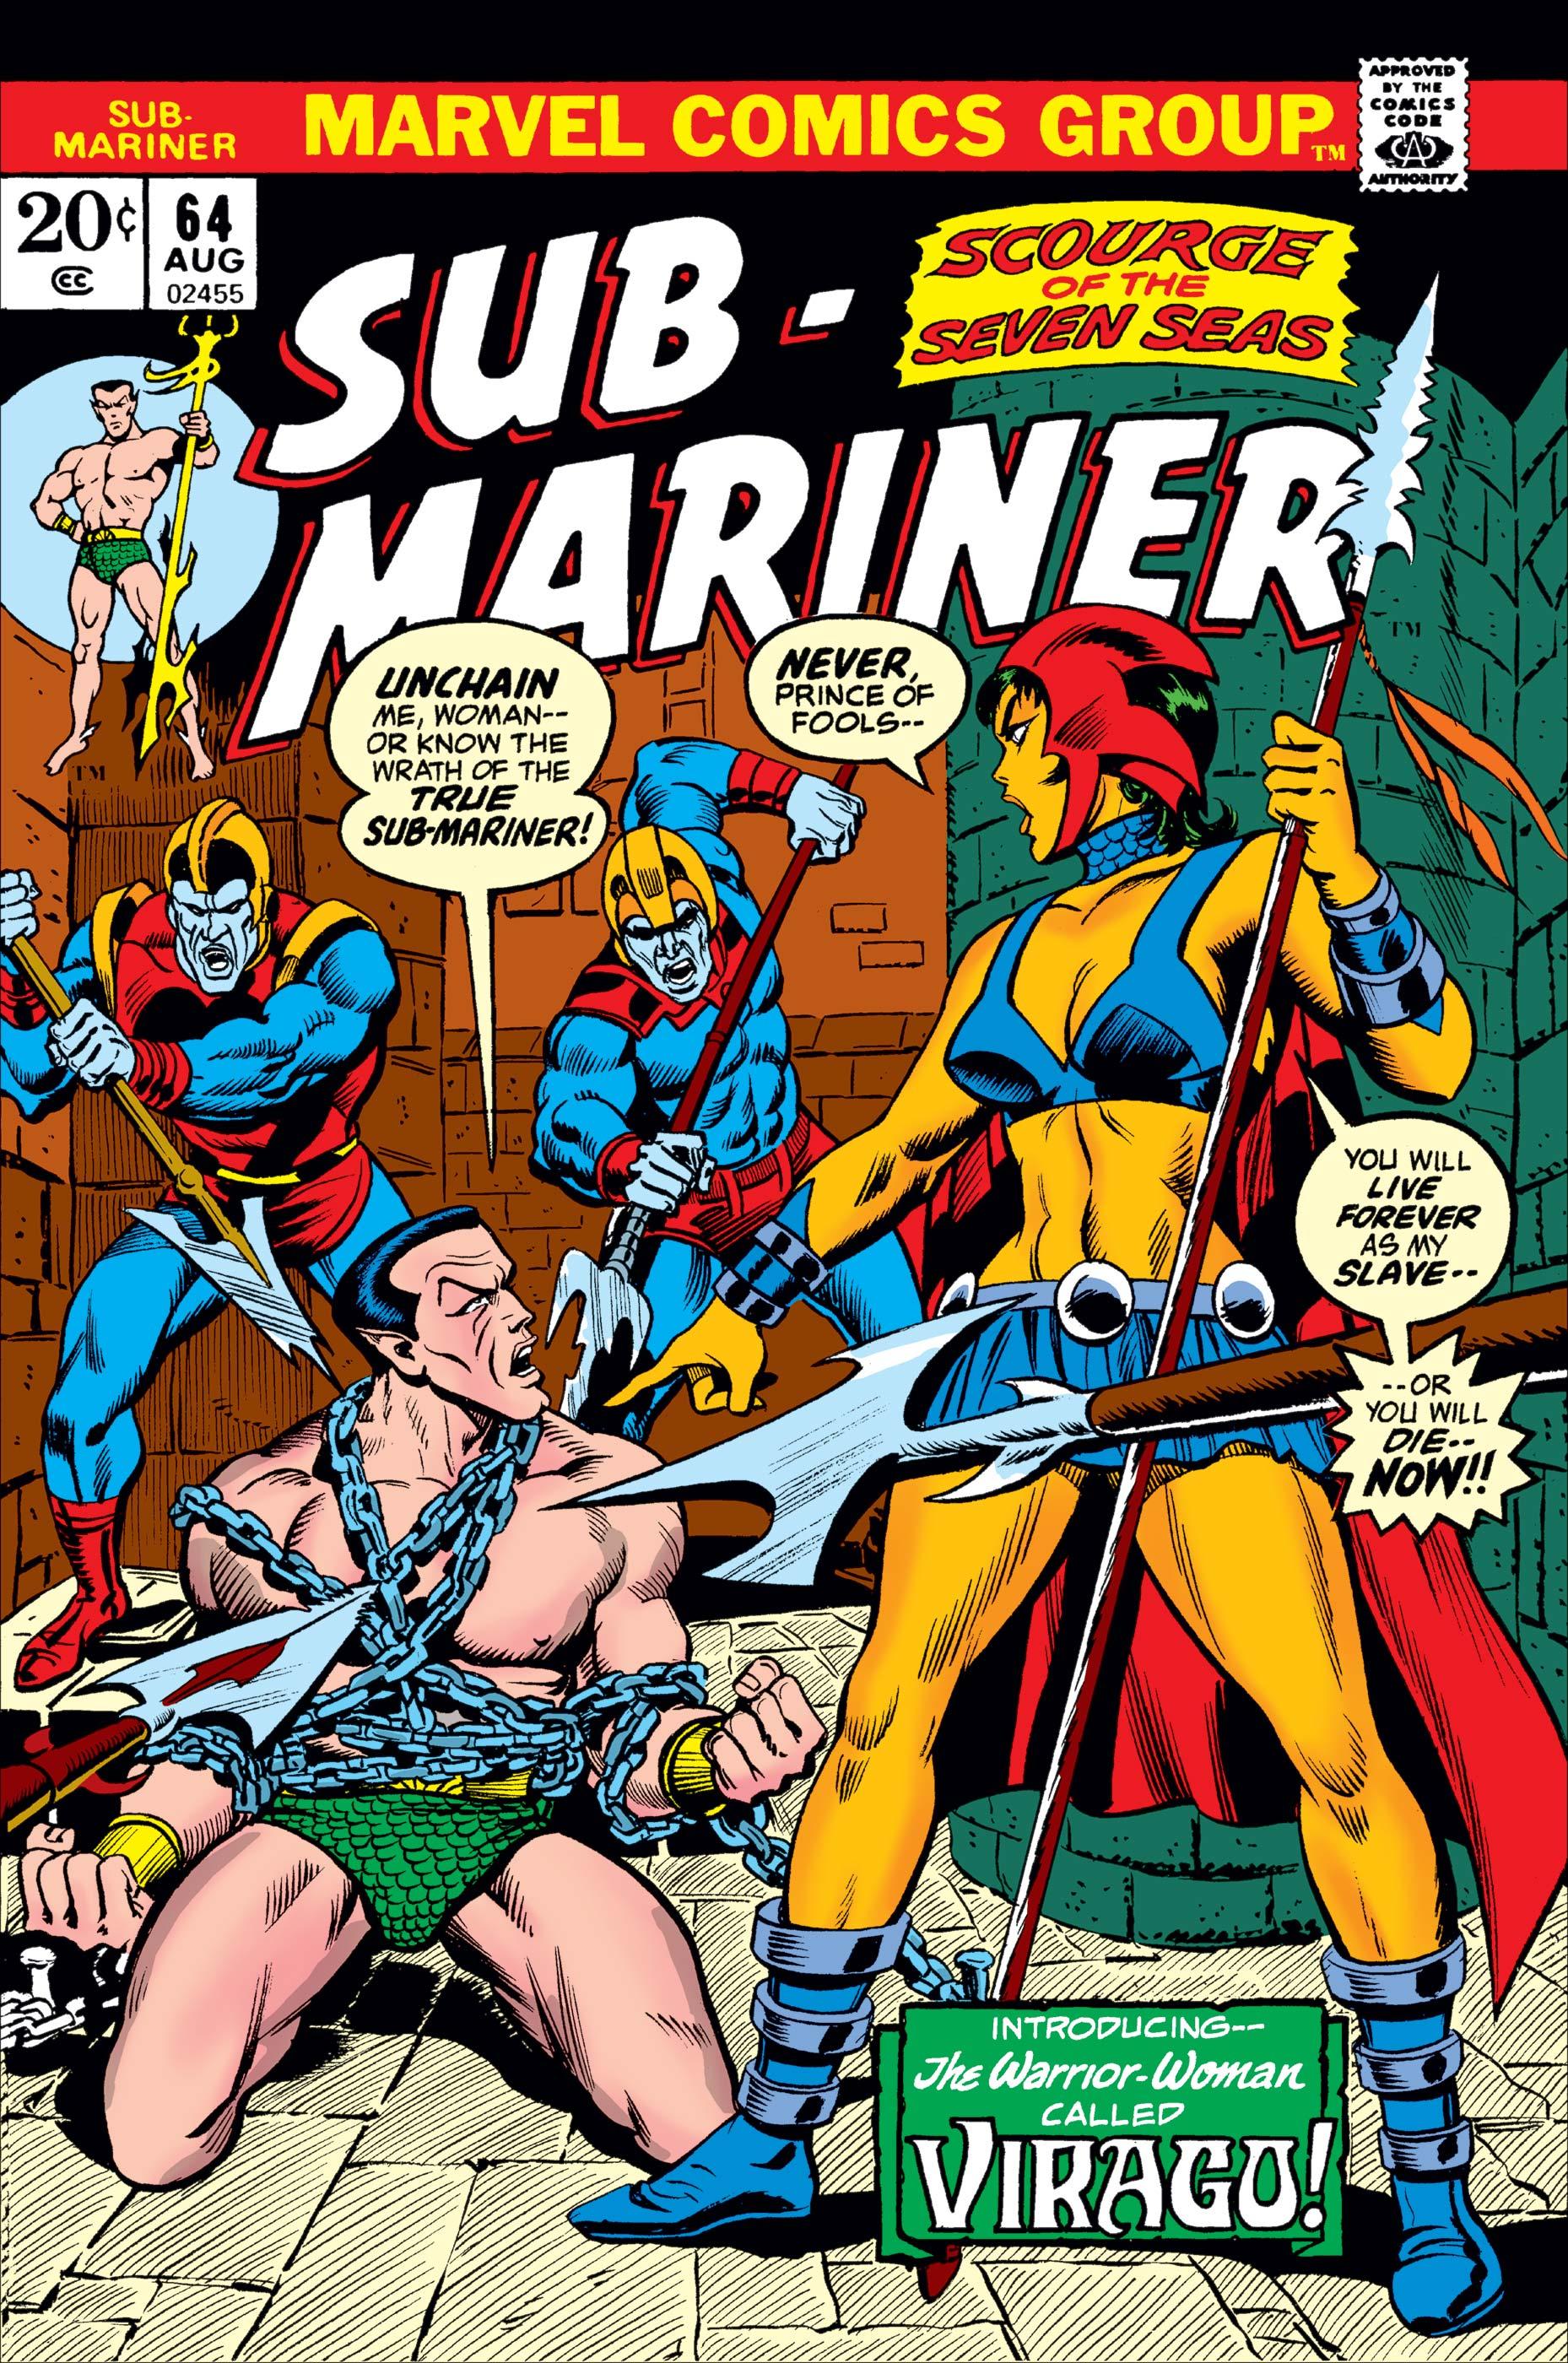 Sub-Mariner (1968) #64